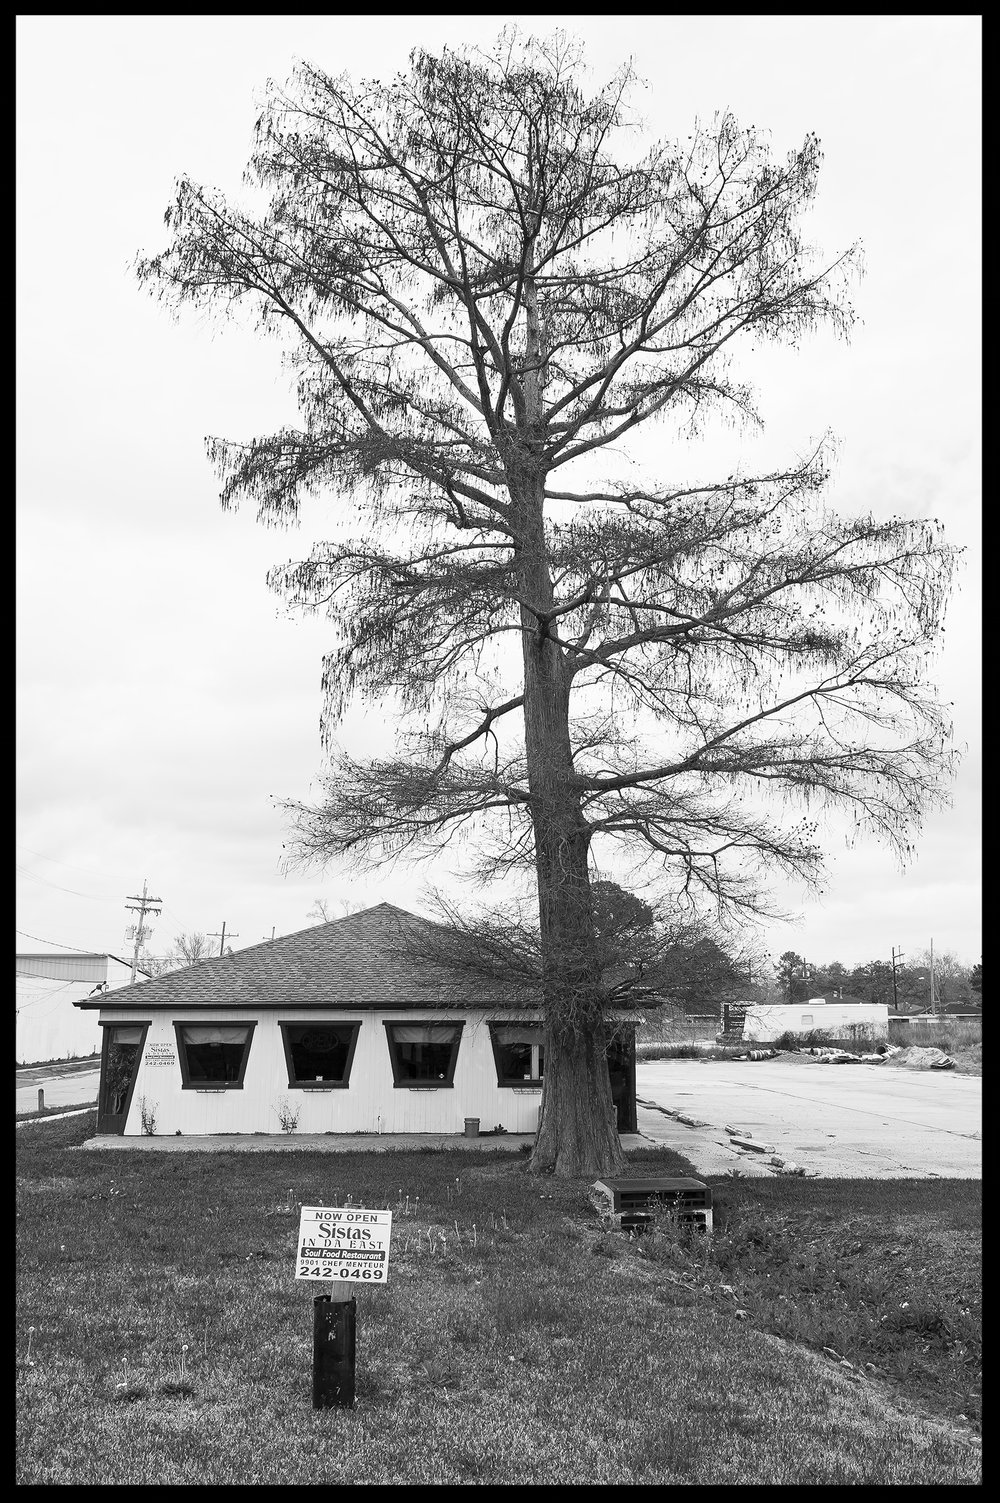 sistas tree.jpg